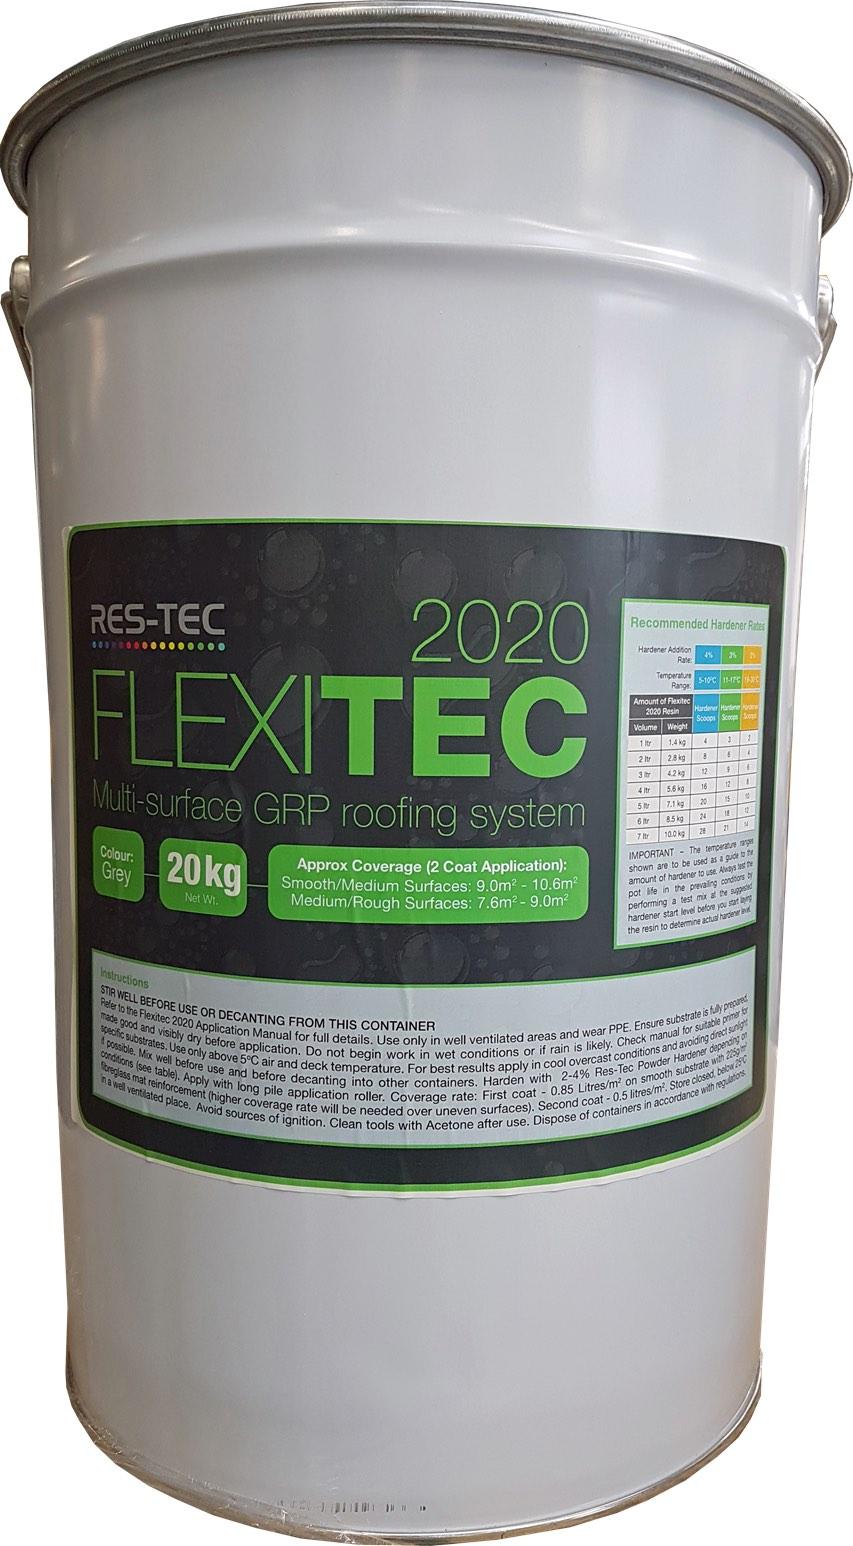 Flexitec 2020 Resin & Topcoat